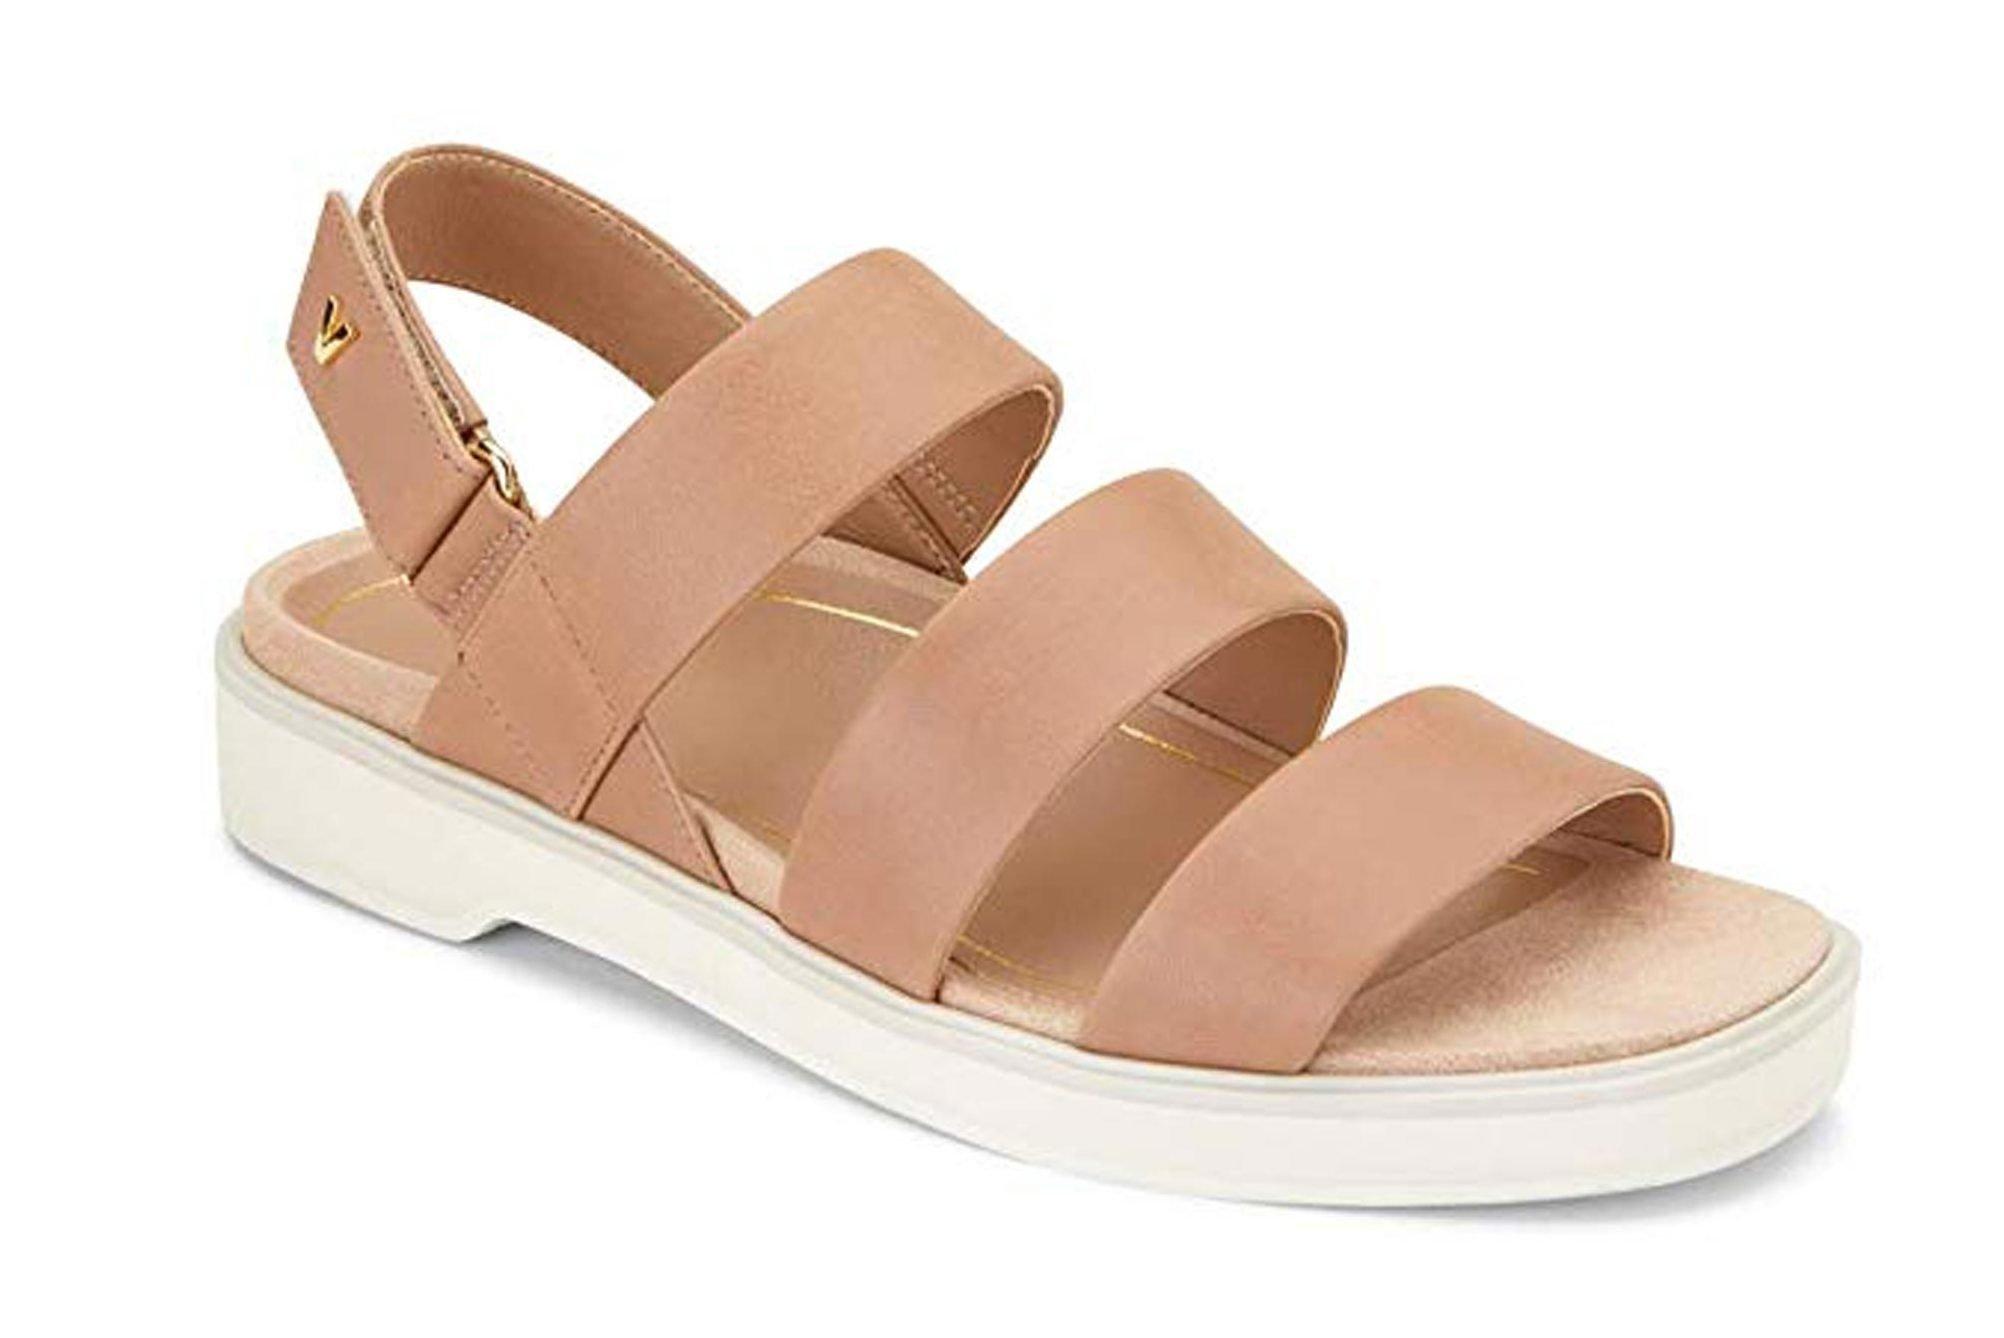 Vionic Women's Leila Keomi Backstrap Sandal - Ladies Concealed Orthotic Support Sandal